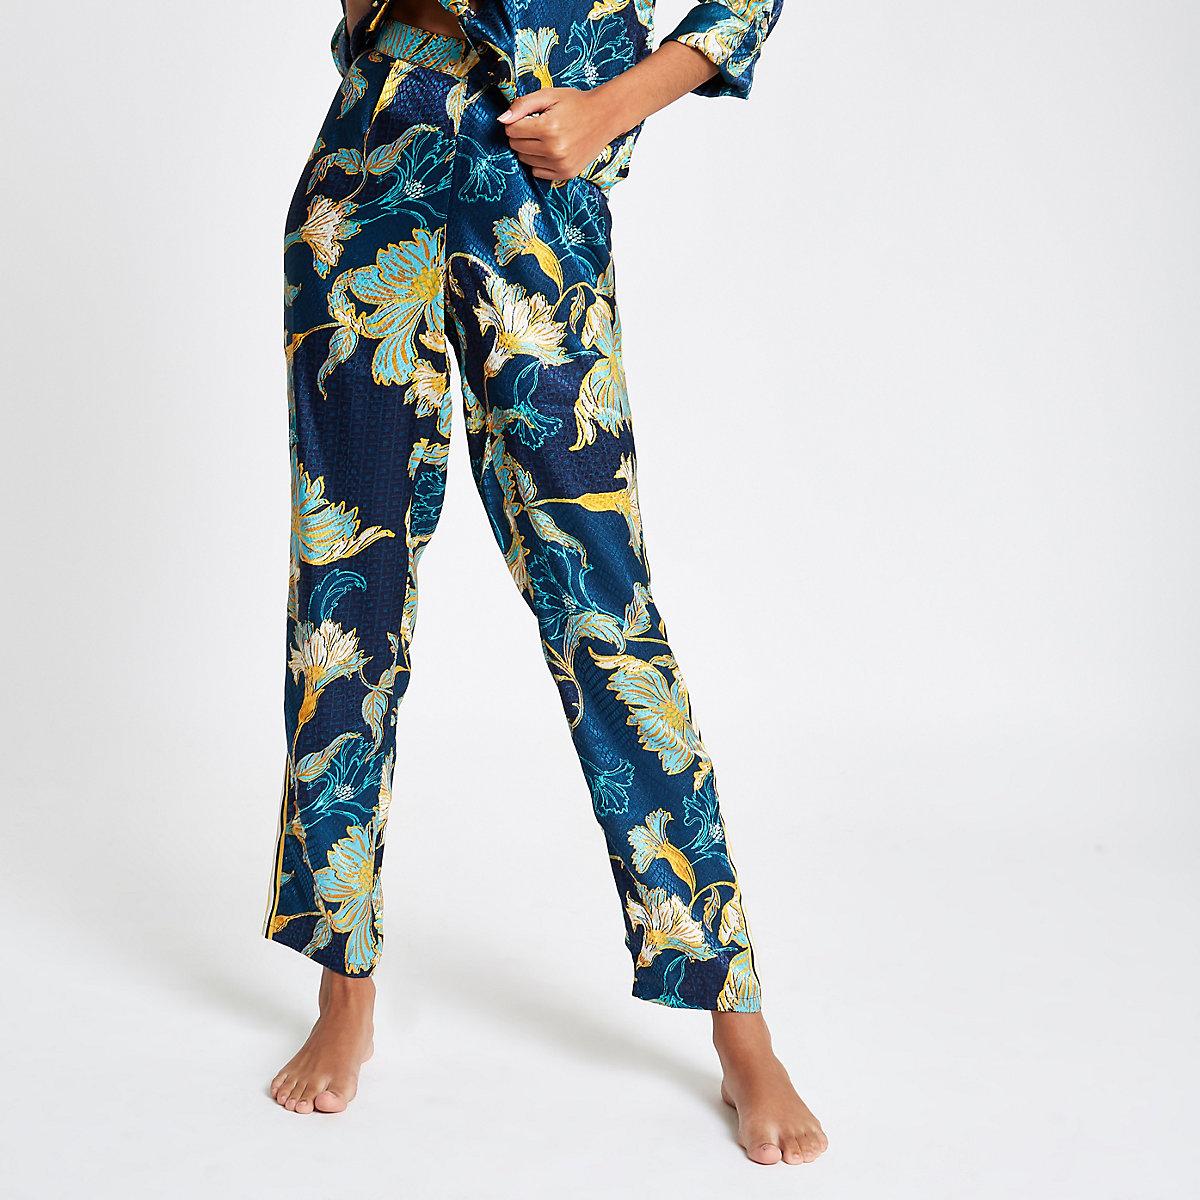 Blue floral satin wide leg pajama pants